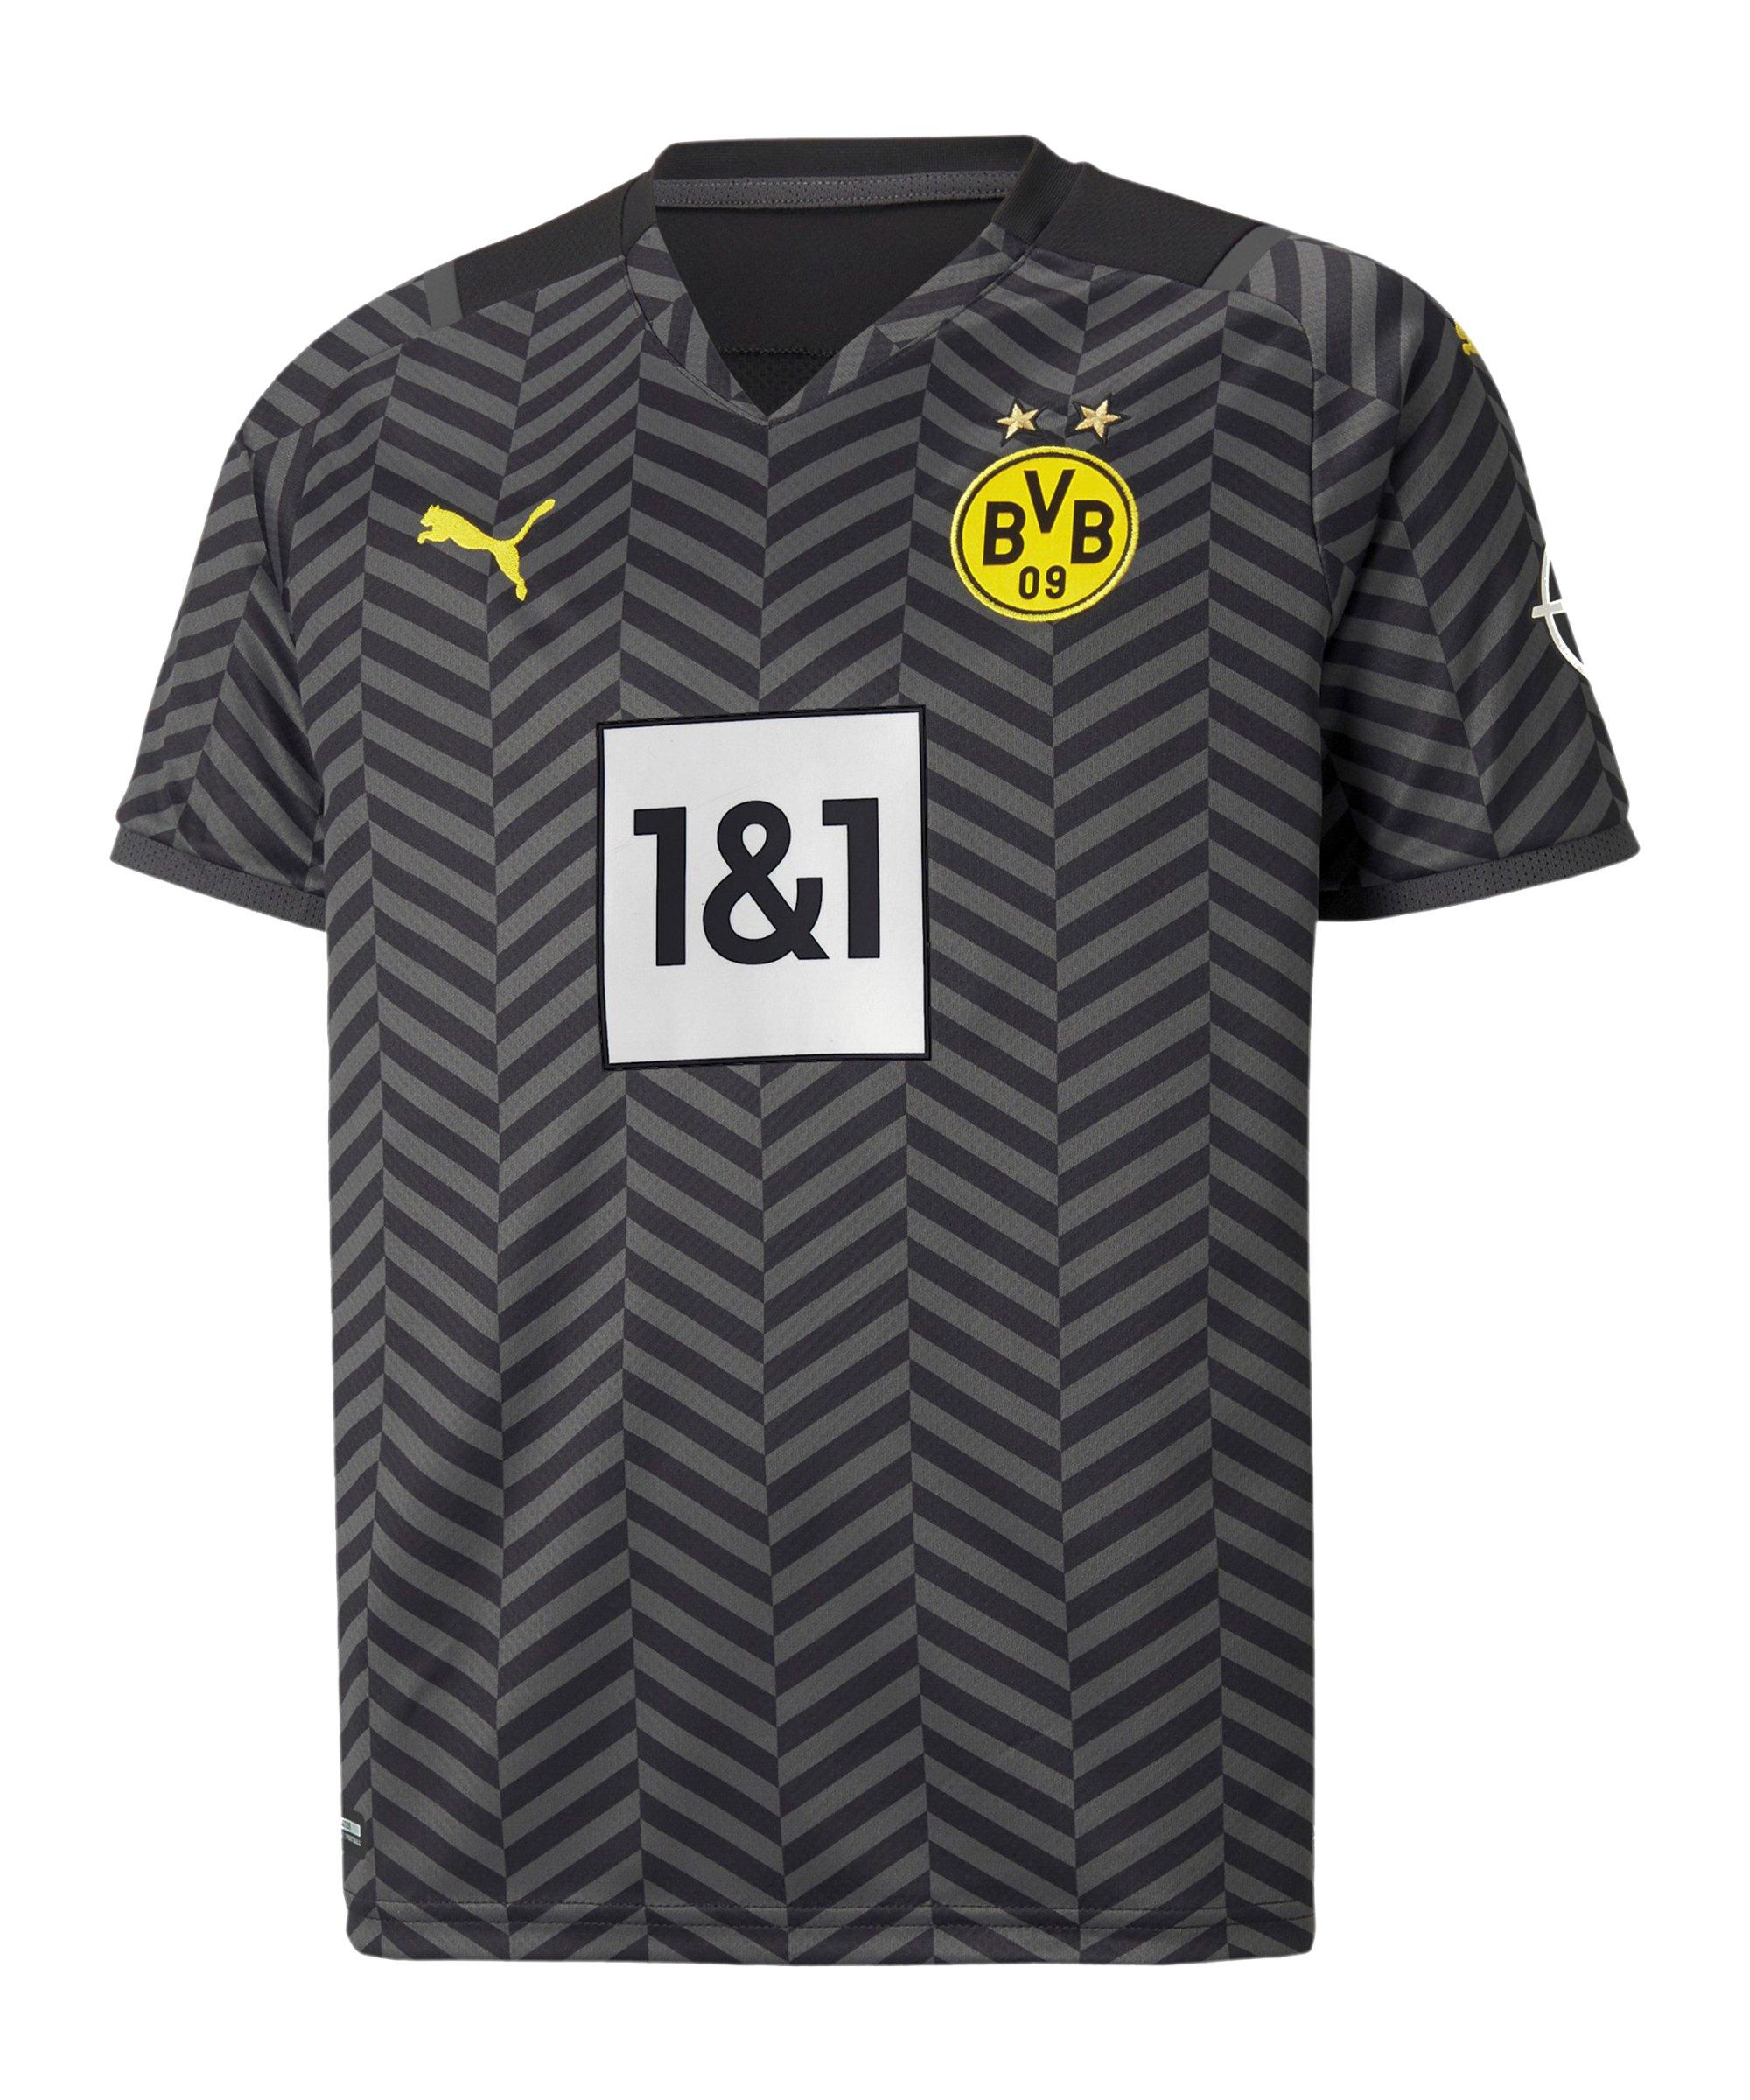 PUMA BVB Dortmund Trikot Away 2021/2022 Kids Grau F04 - grau